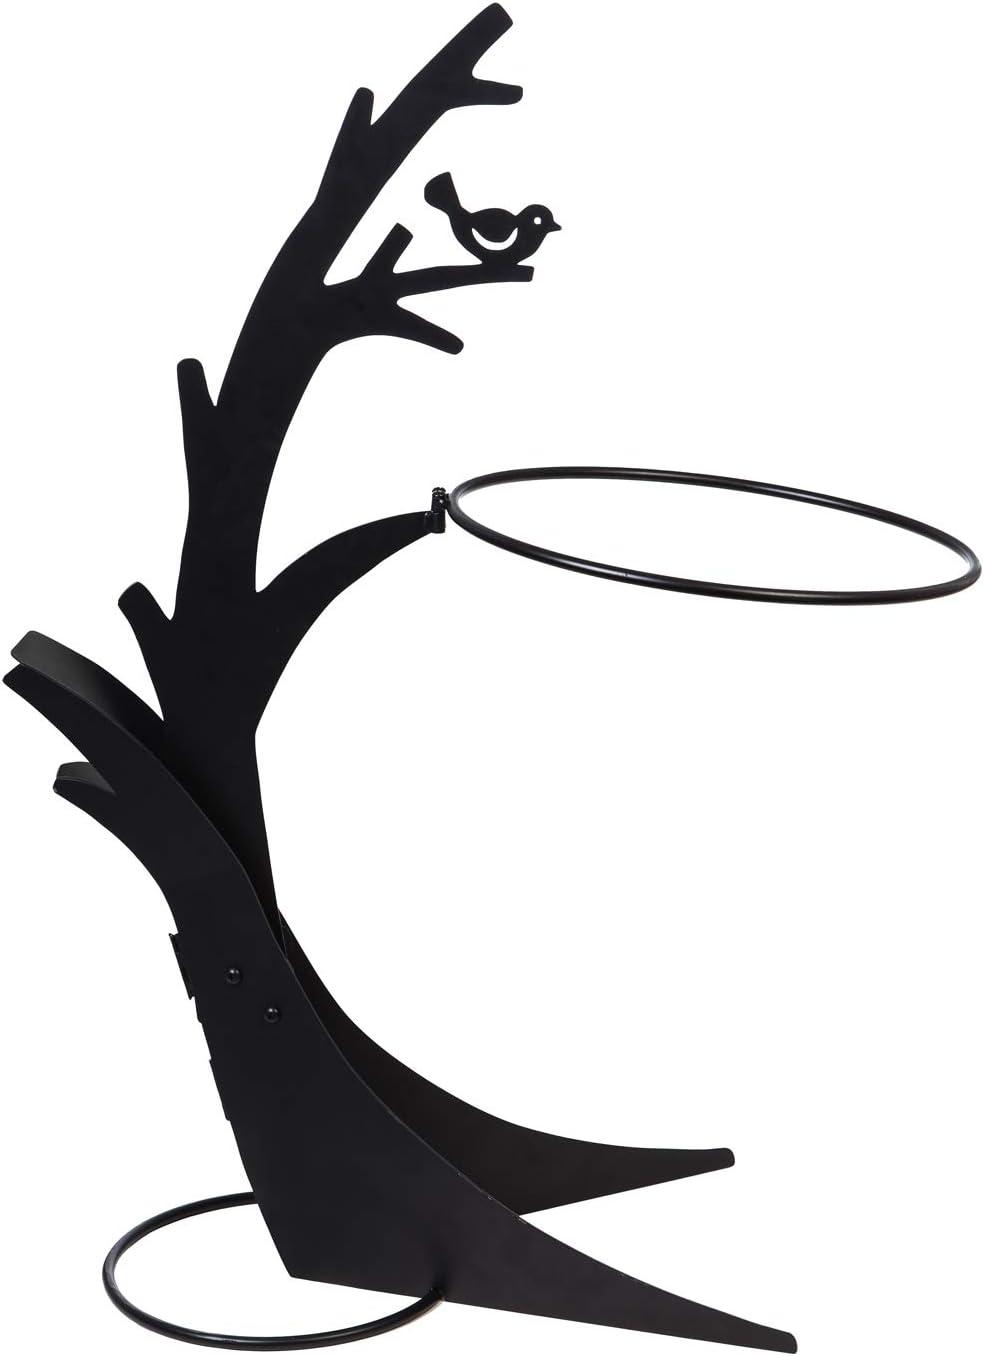 Evergreen Garden Sturdy Black Metal Tree Shaped Birdbath Stand - 18 x 13 x 36 Inches